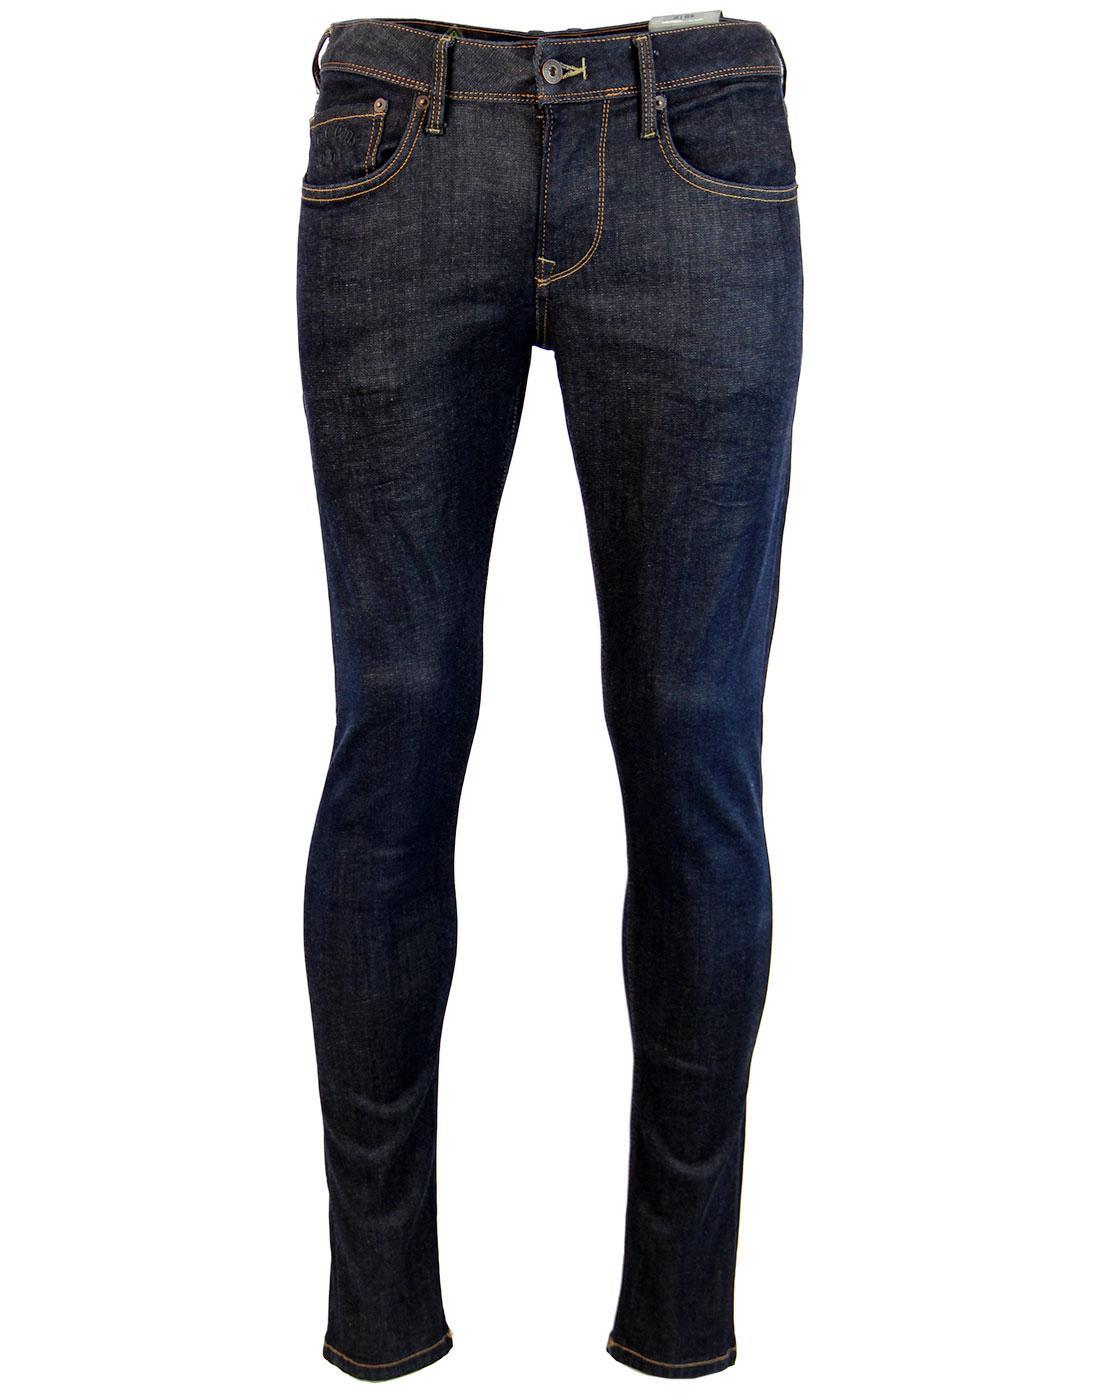 Finsbury PEPE JEANS Dark Blue Drainpipe Jeans Z06